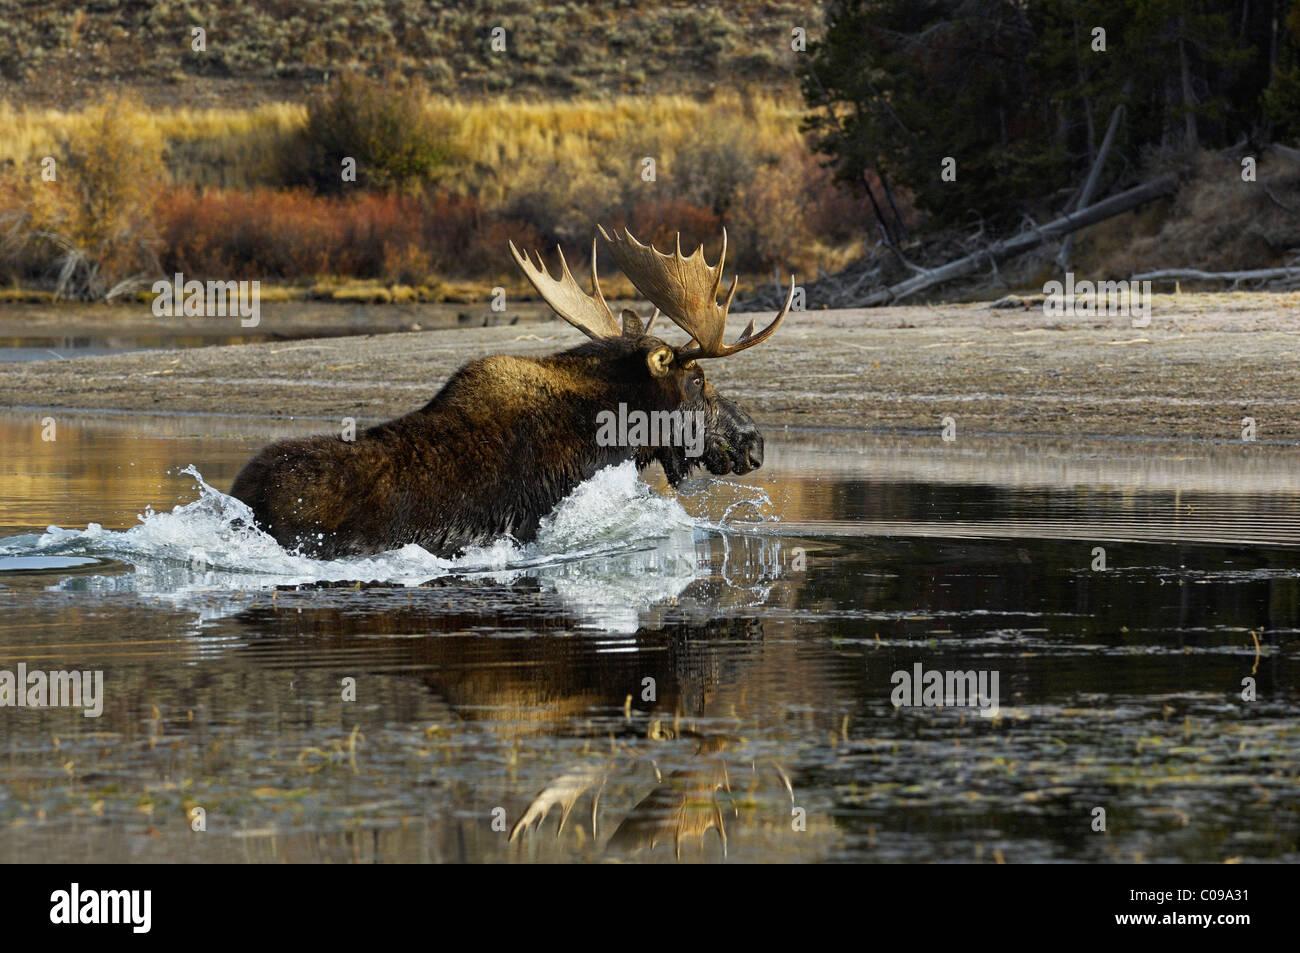 Bull Moose racing across the Snake River in Grand Teton National Park. - Stock Image